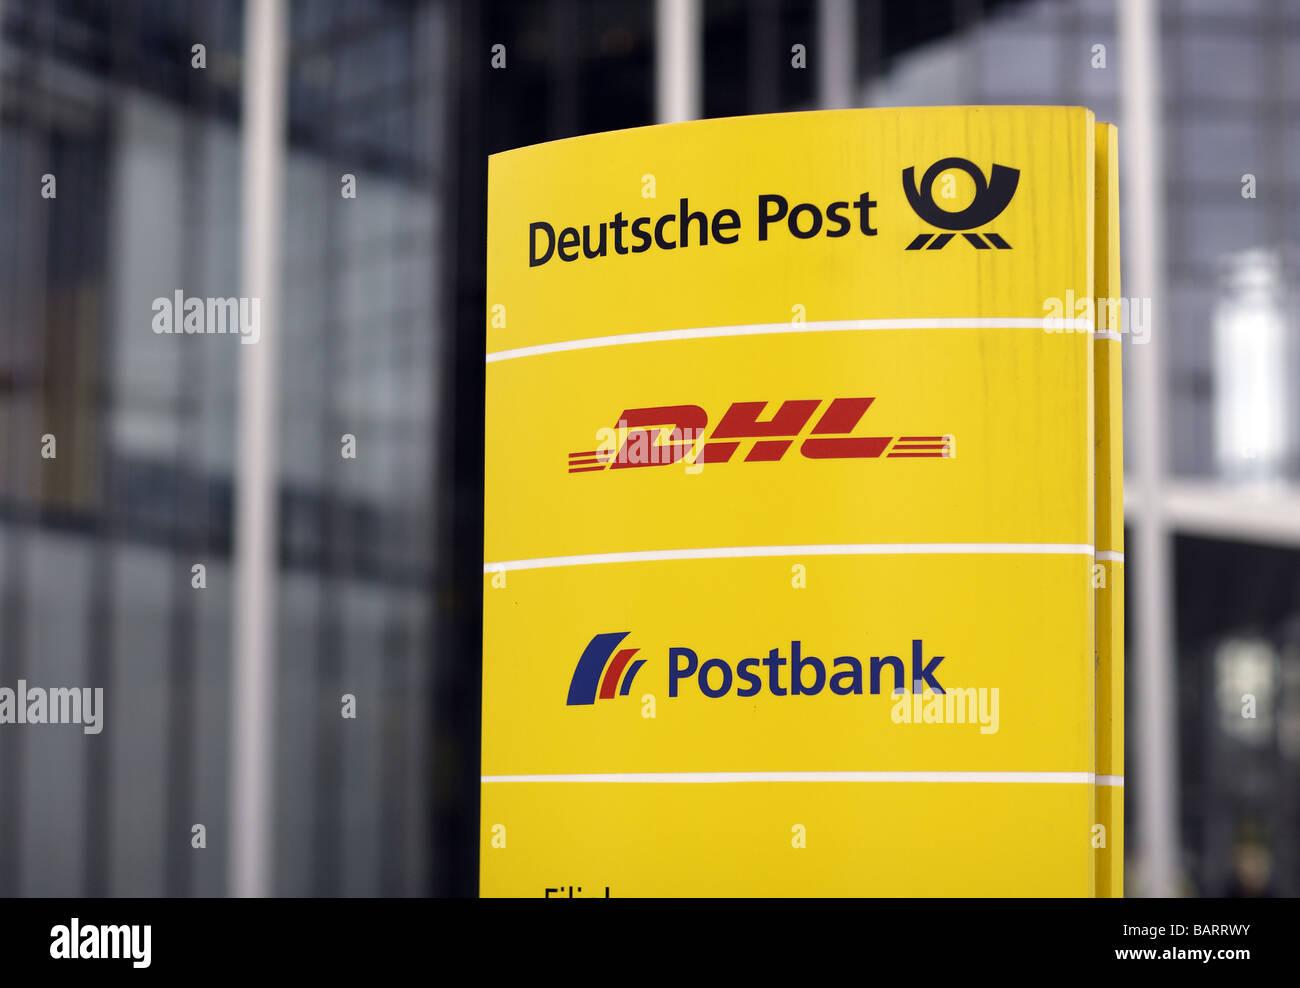 Logos Deutsche Post DHL Postbank Stock Photo